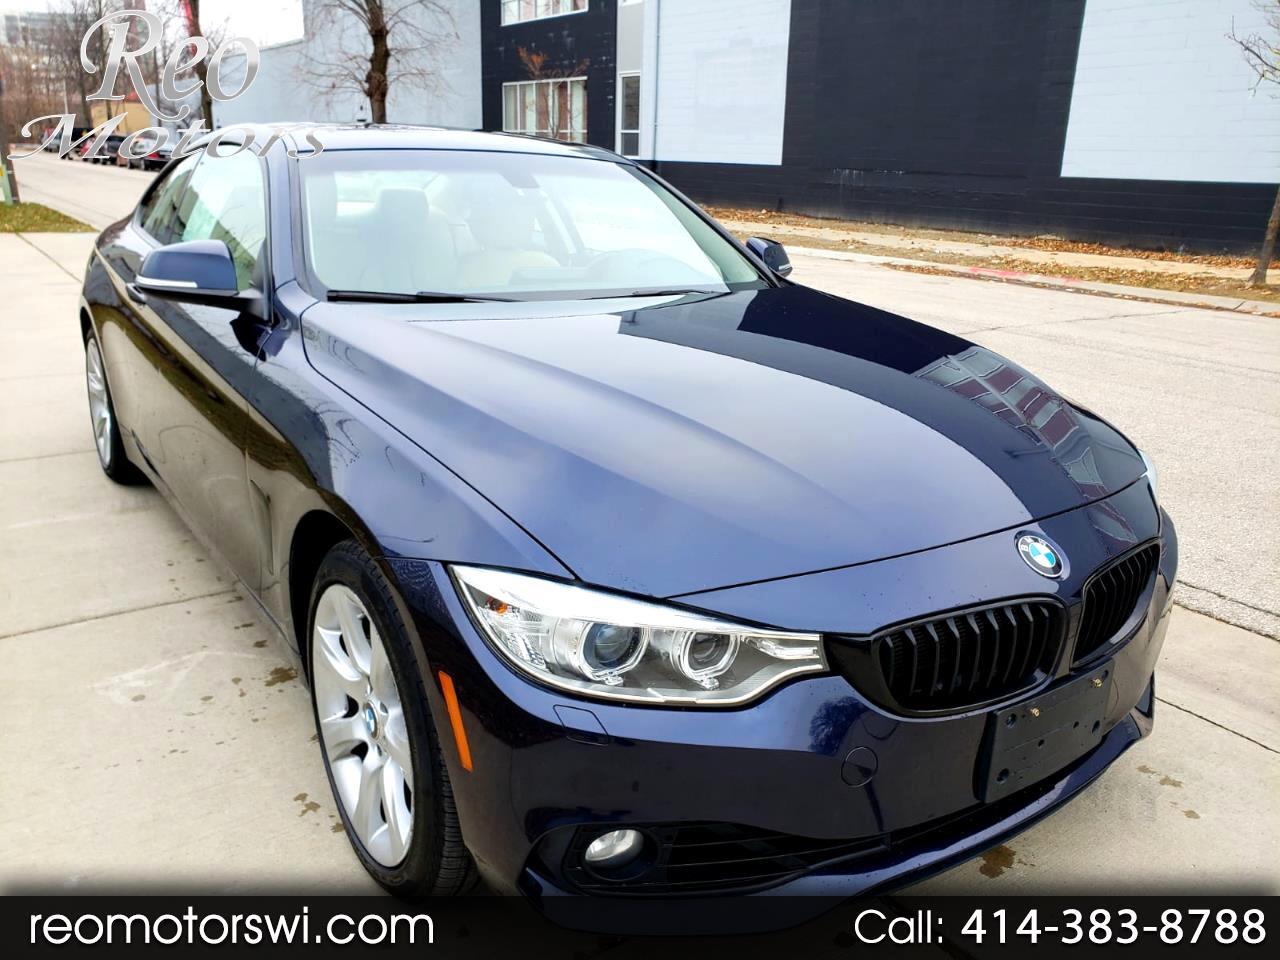 Used Cars For Sale Milwaukee >> Used Cars For Sale Milwaukee Wi 53215 Reo Motors